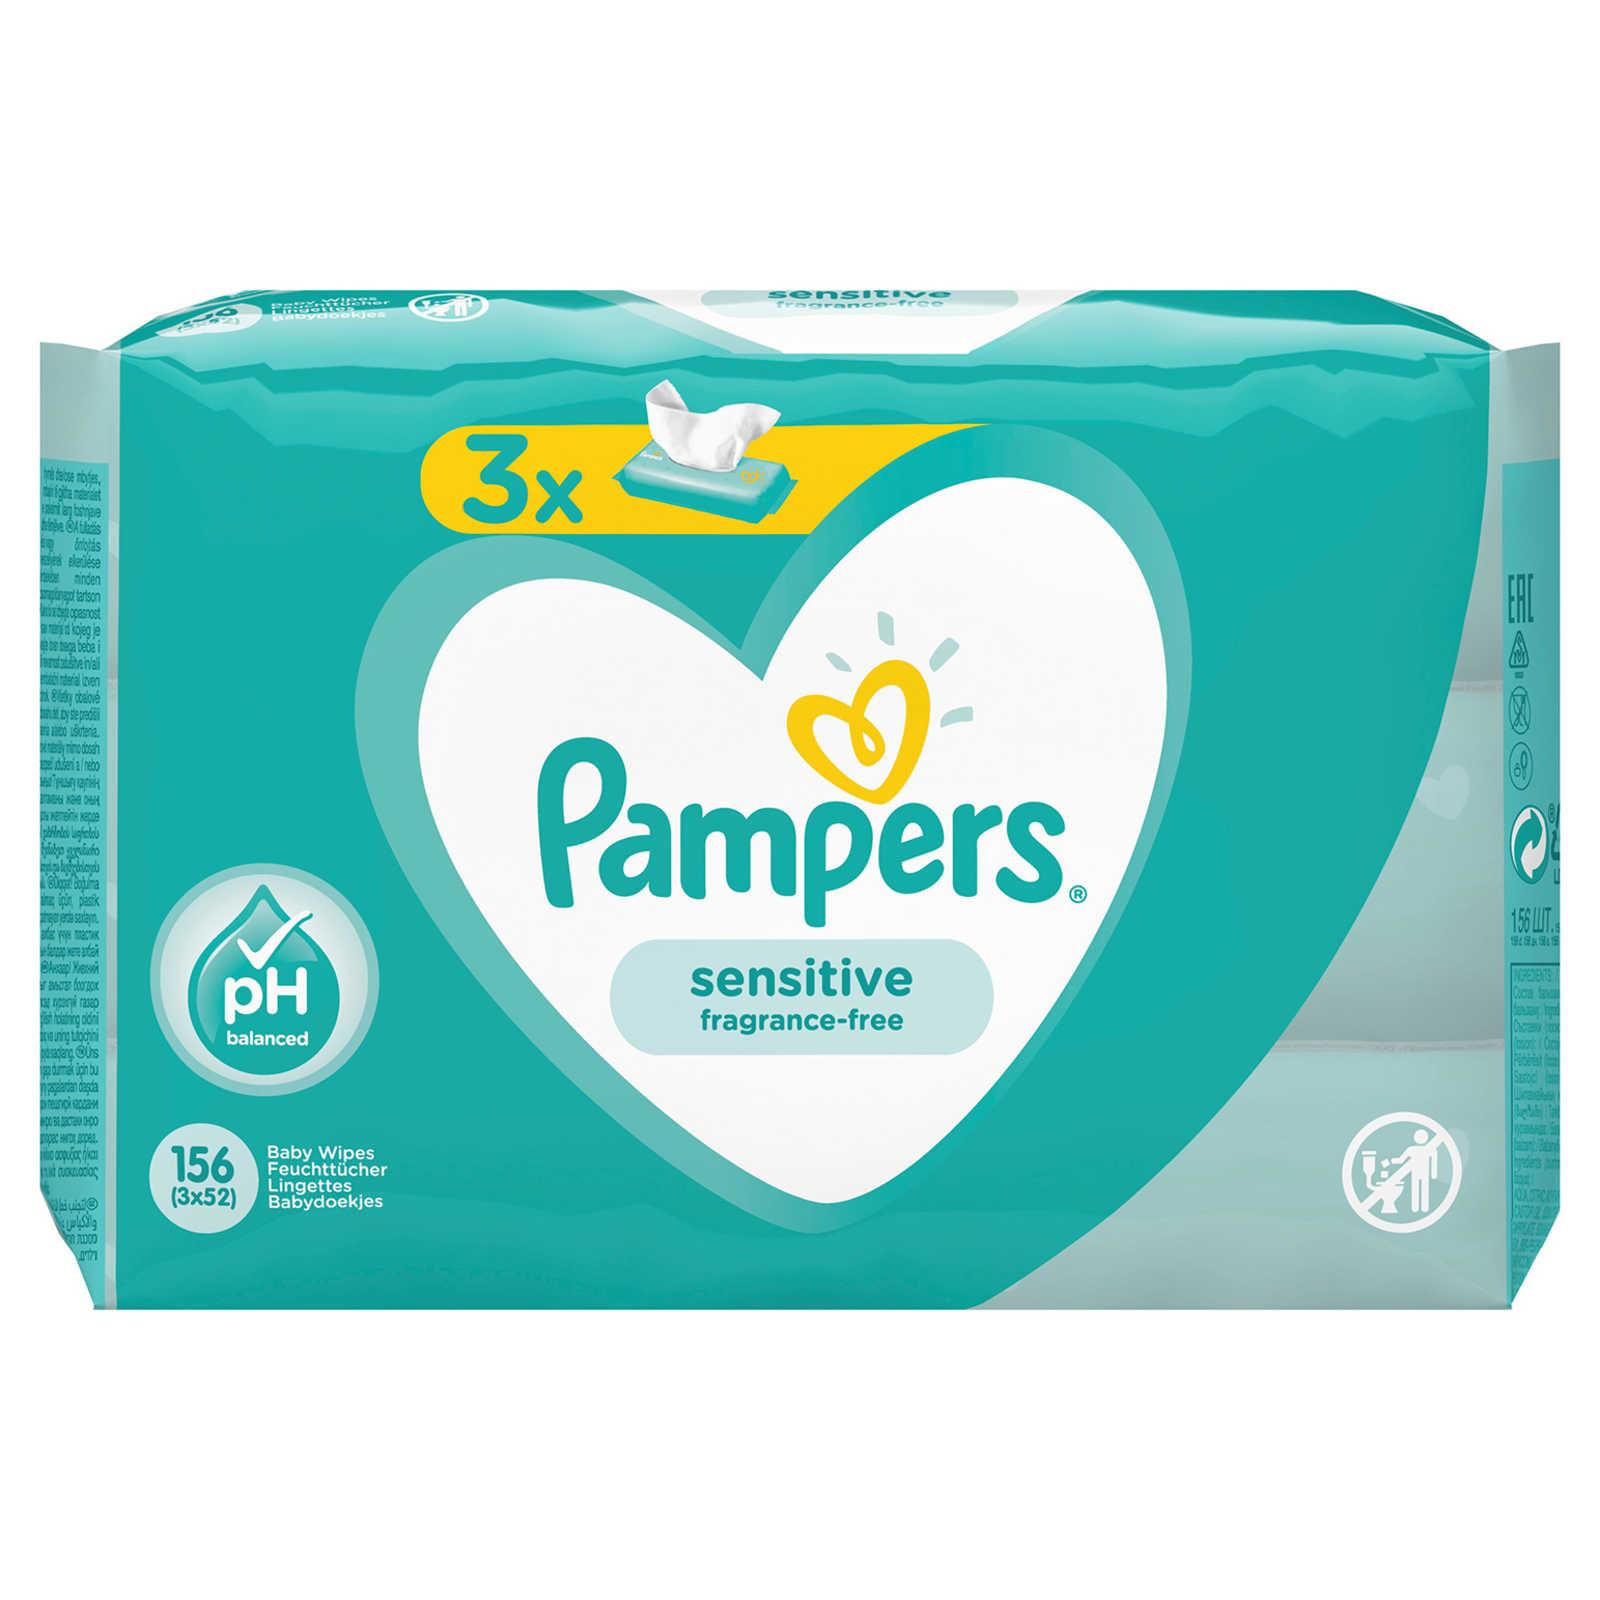 Pampers-Sensitive